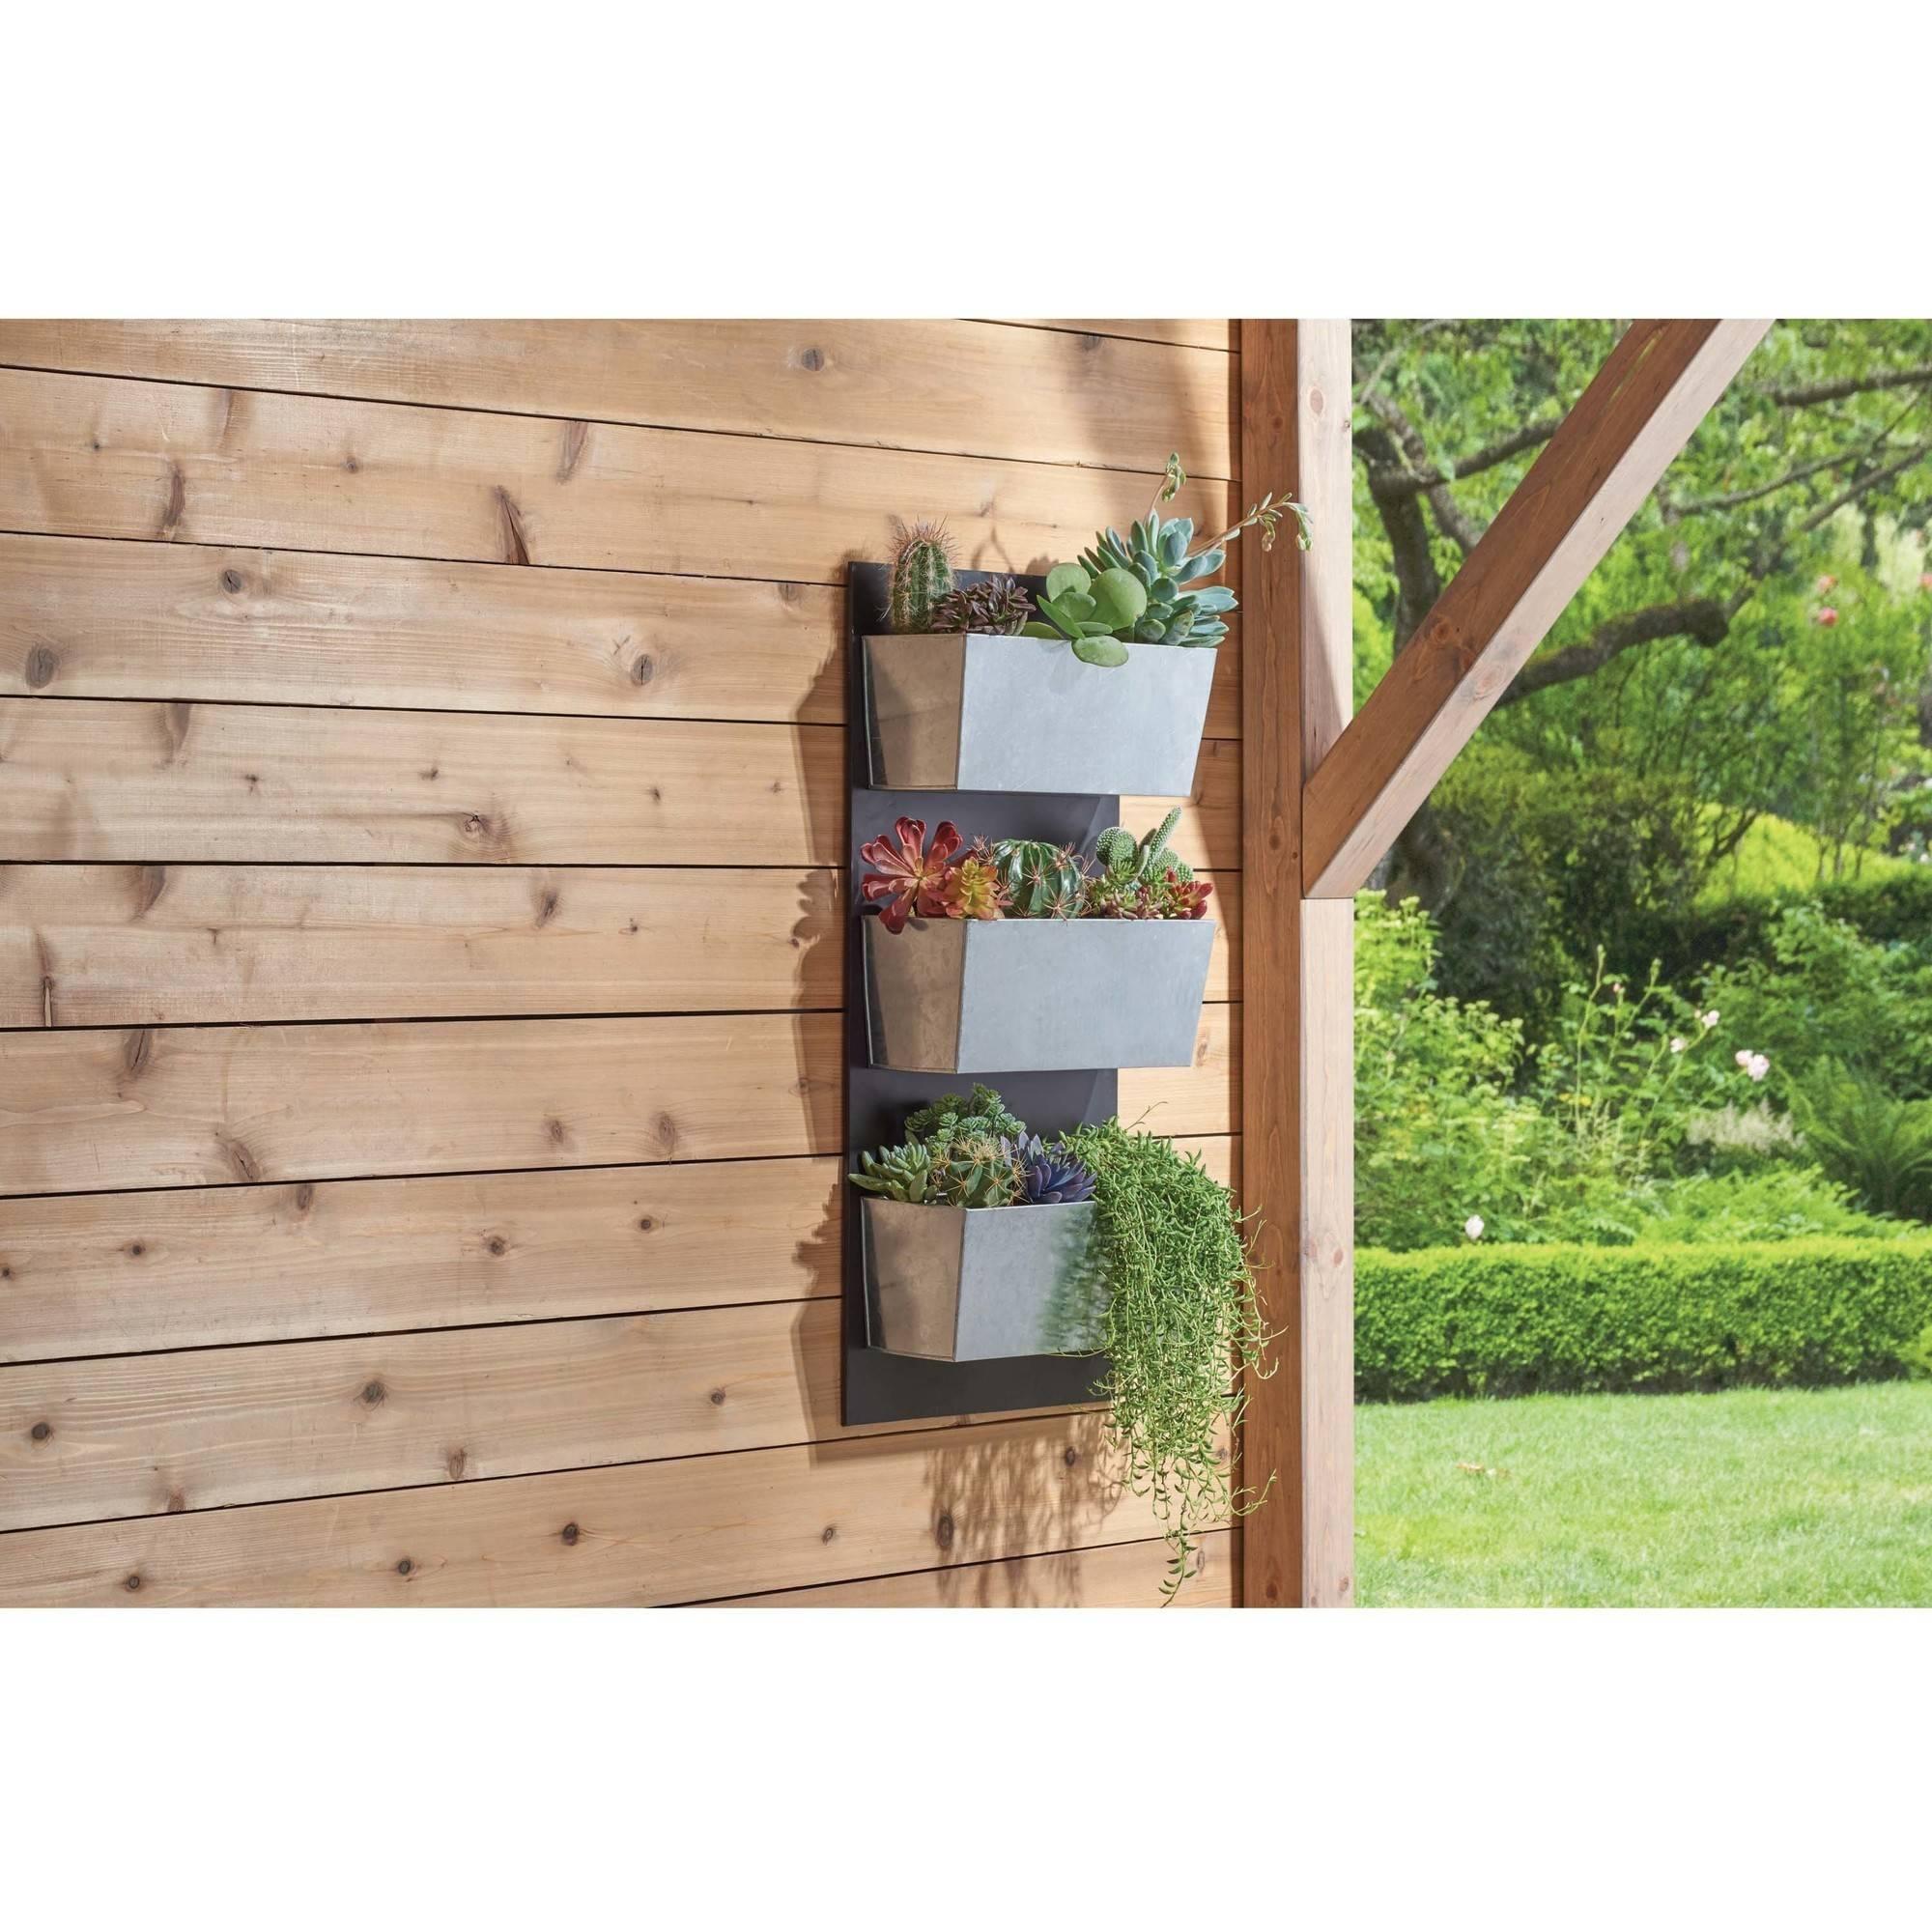 Galvanized-Finish Vertical Planter Grid $13.18